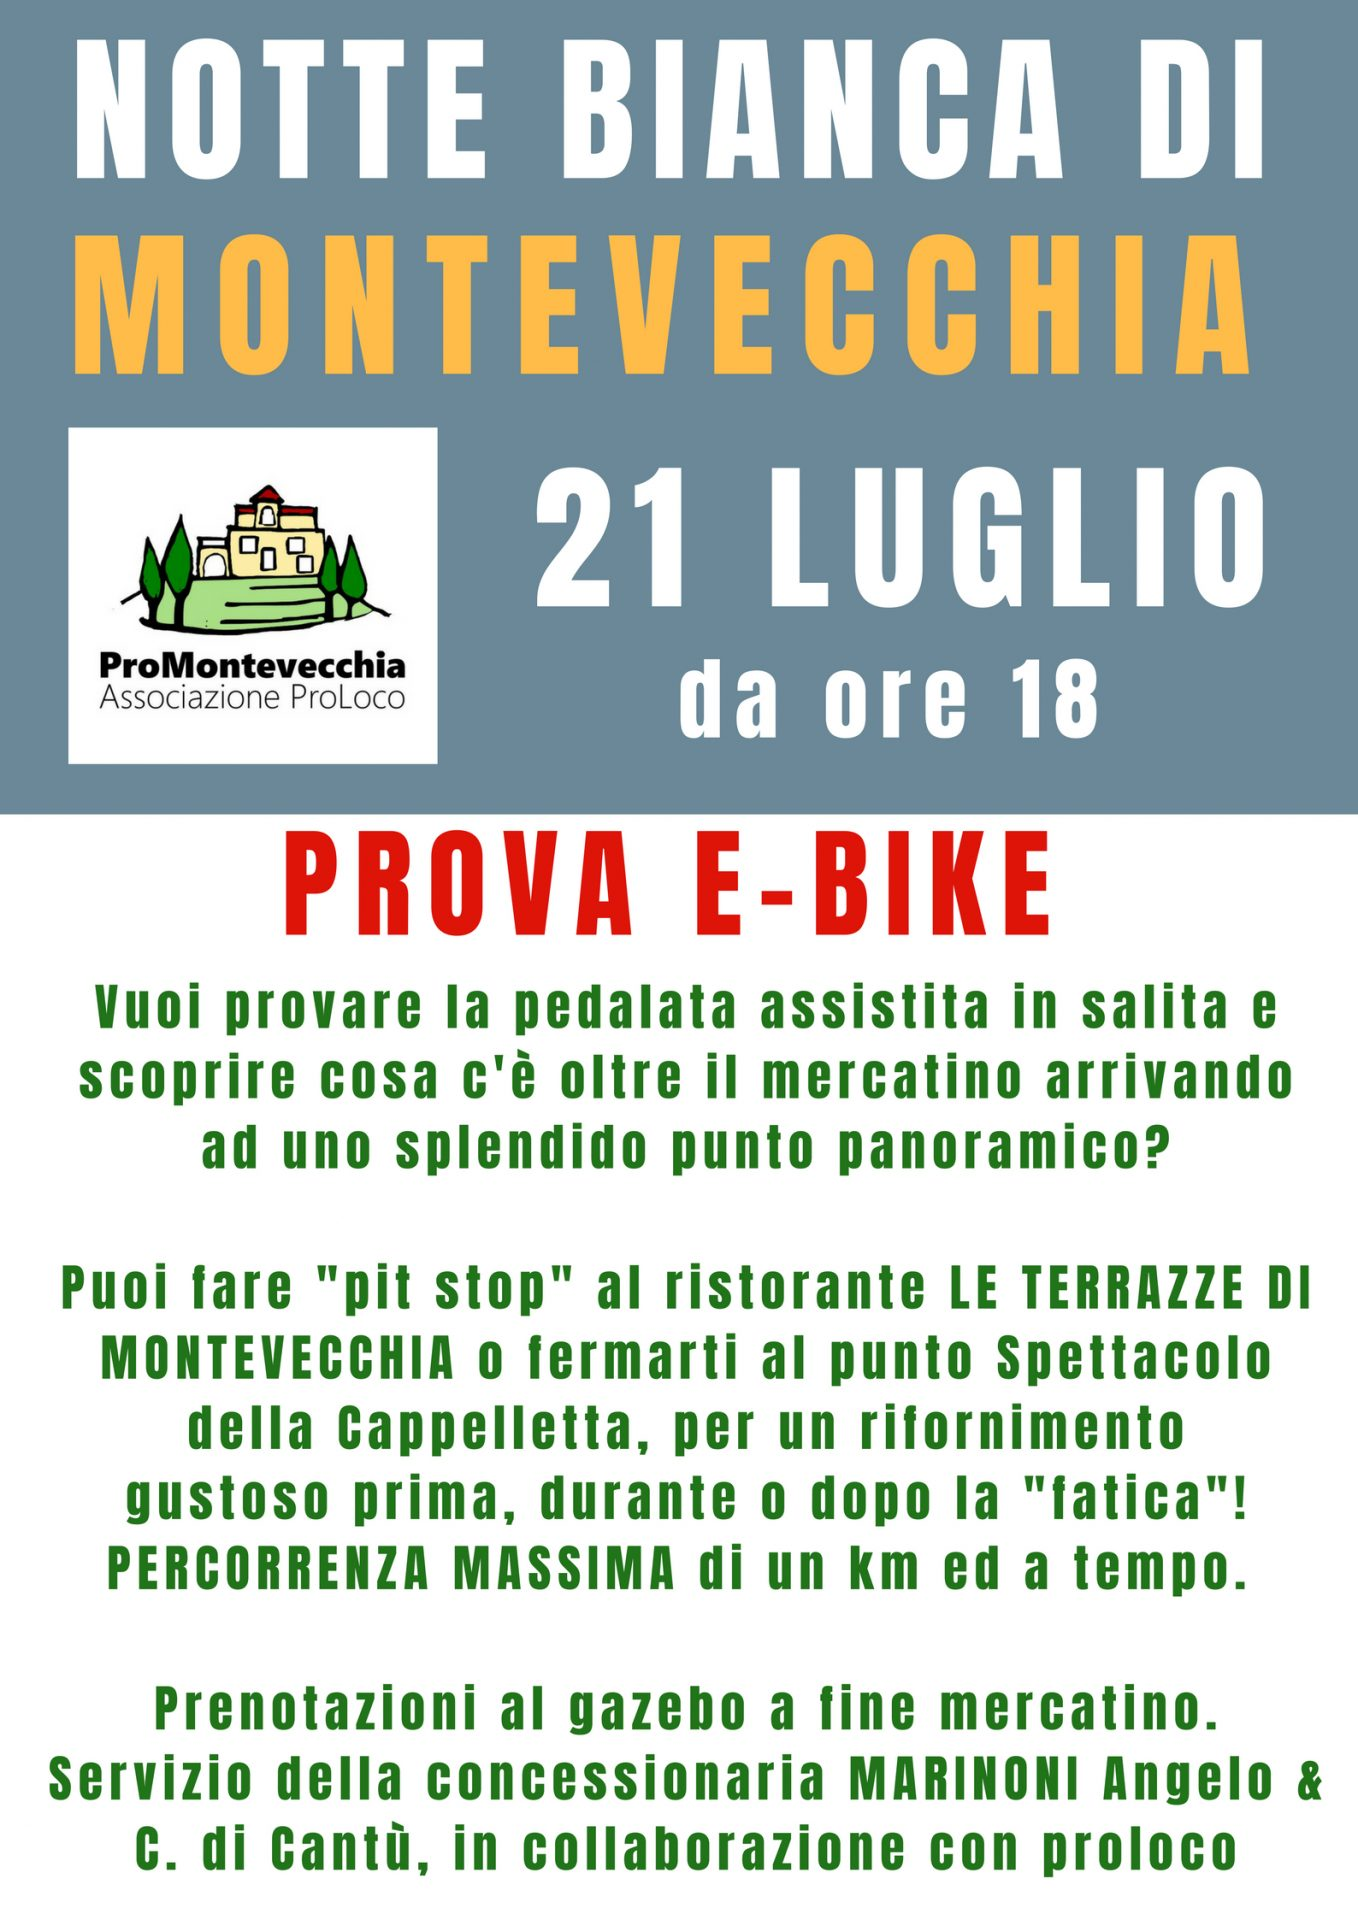 Spettacoli Notte Bianca Montevecchia 2018 | ProMontevecchia